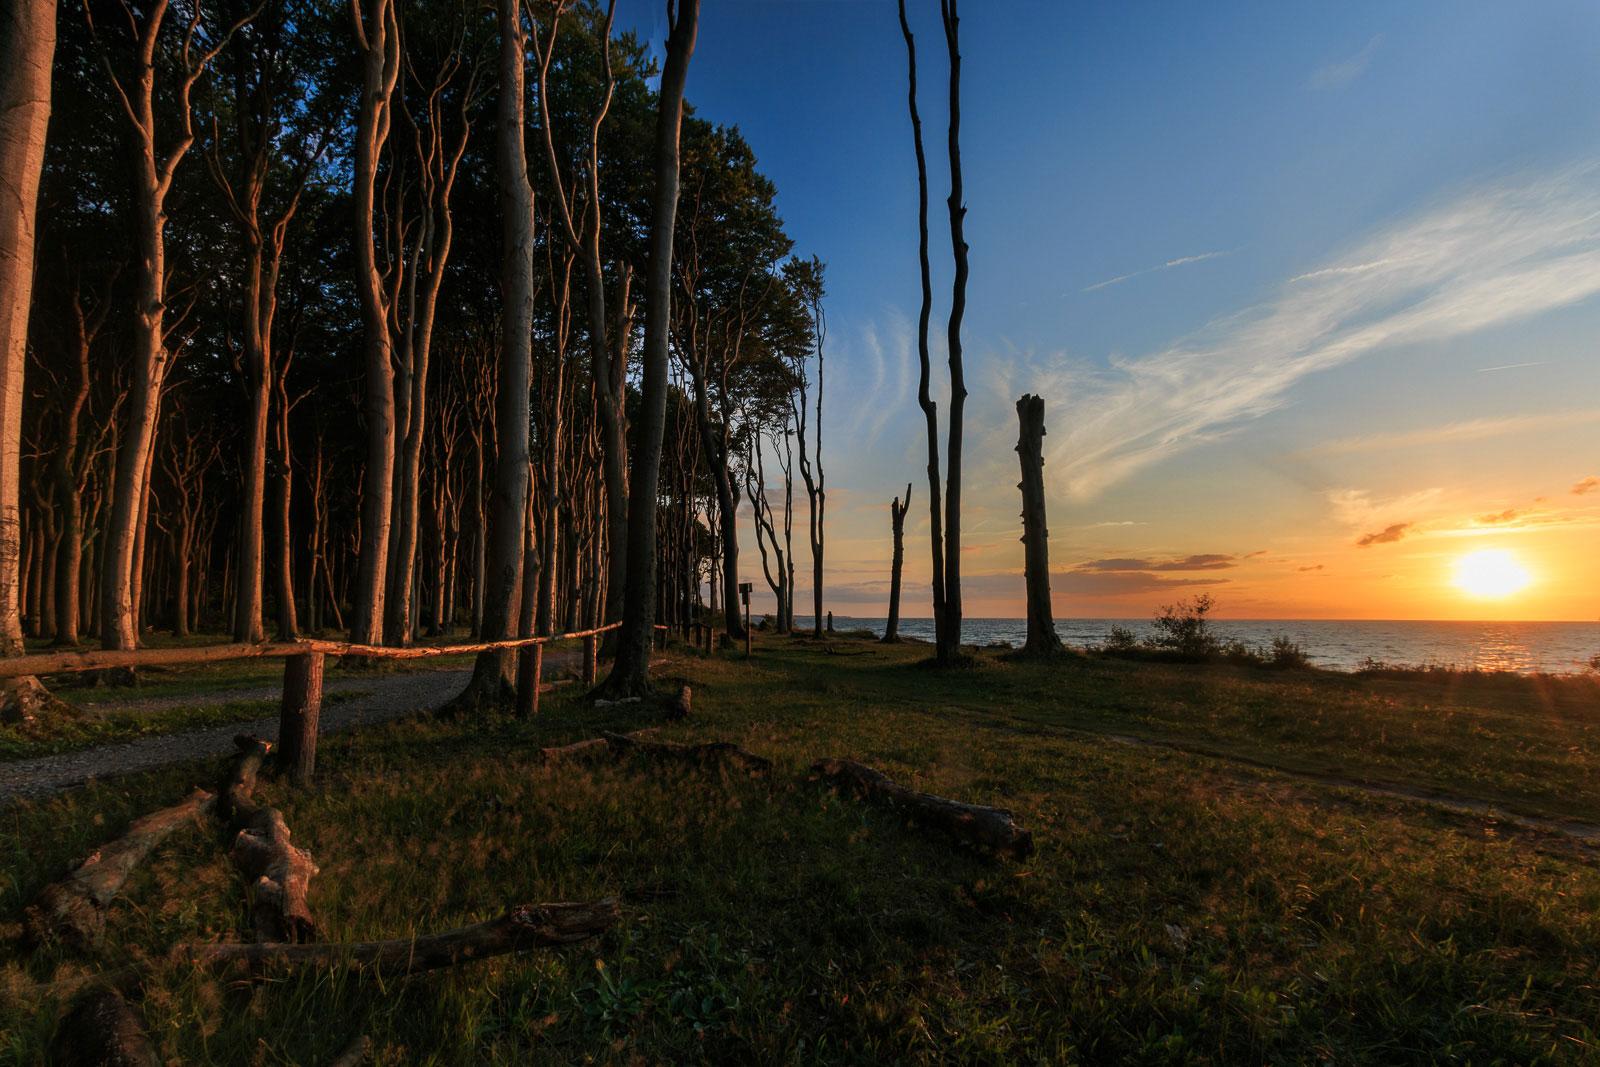 Zum Sonnenuntergang fängt der Wald richtig an zu leuchten.